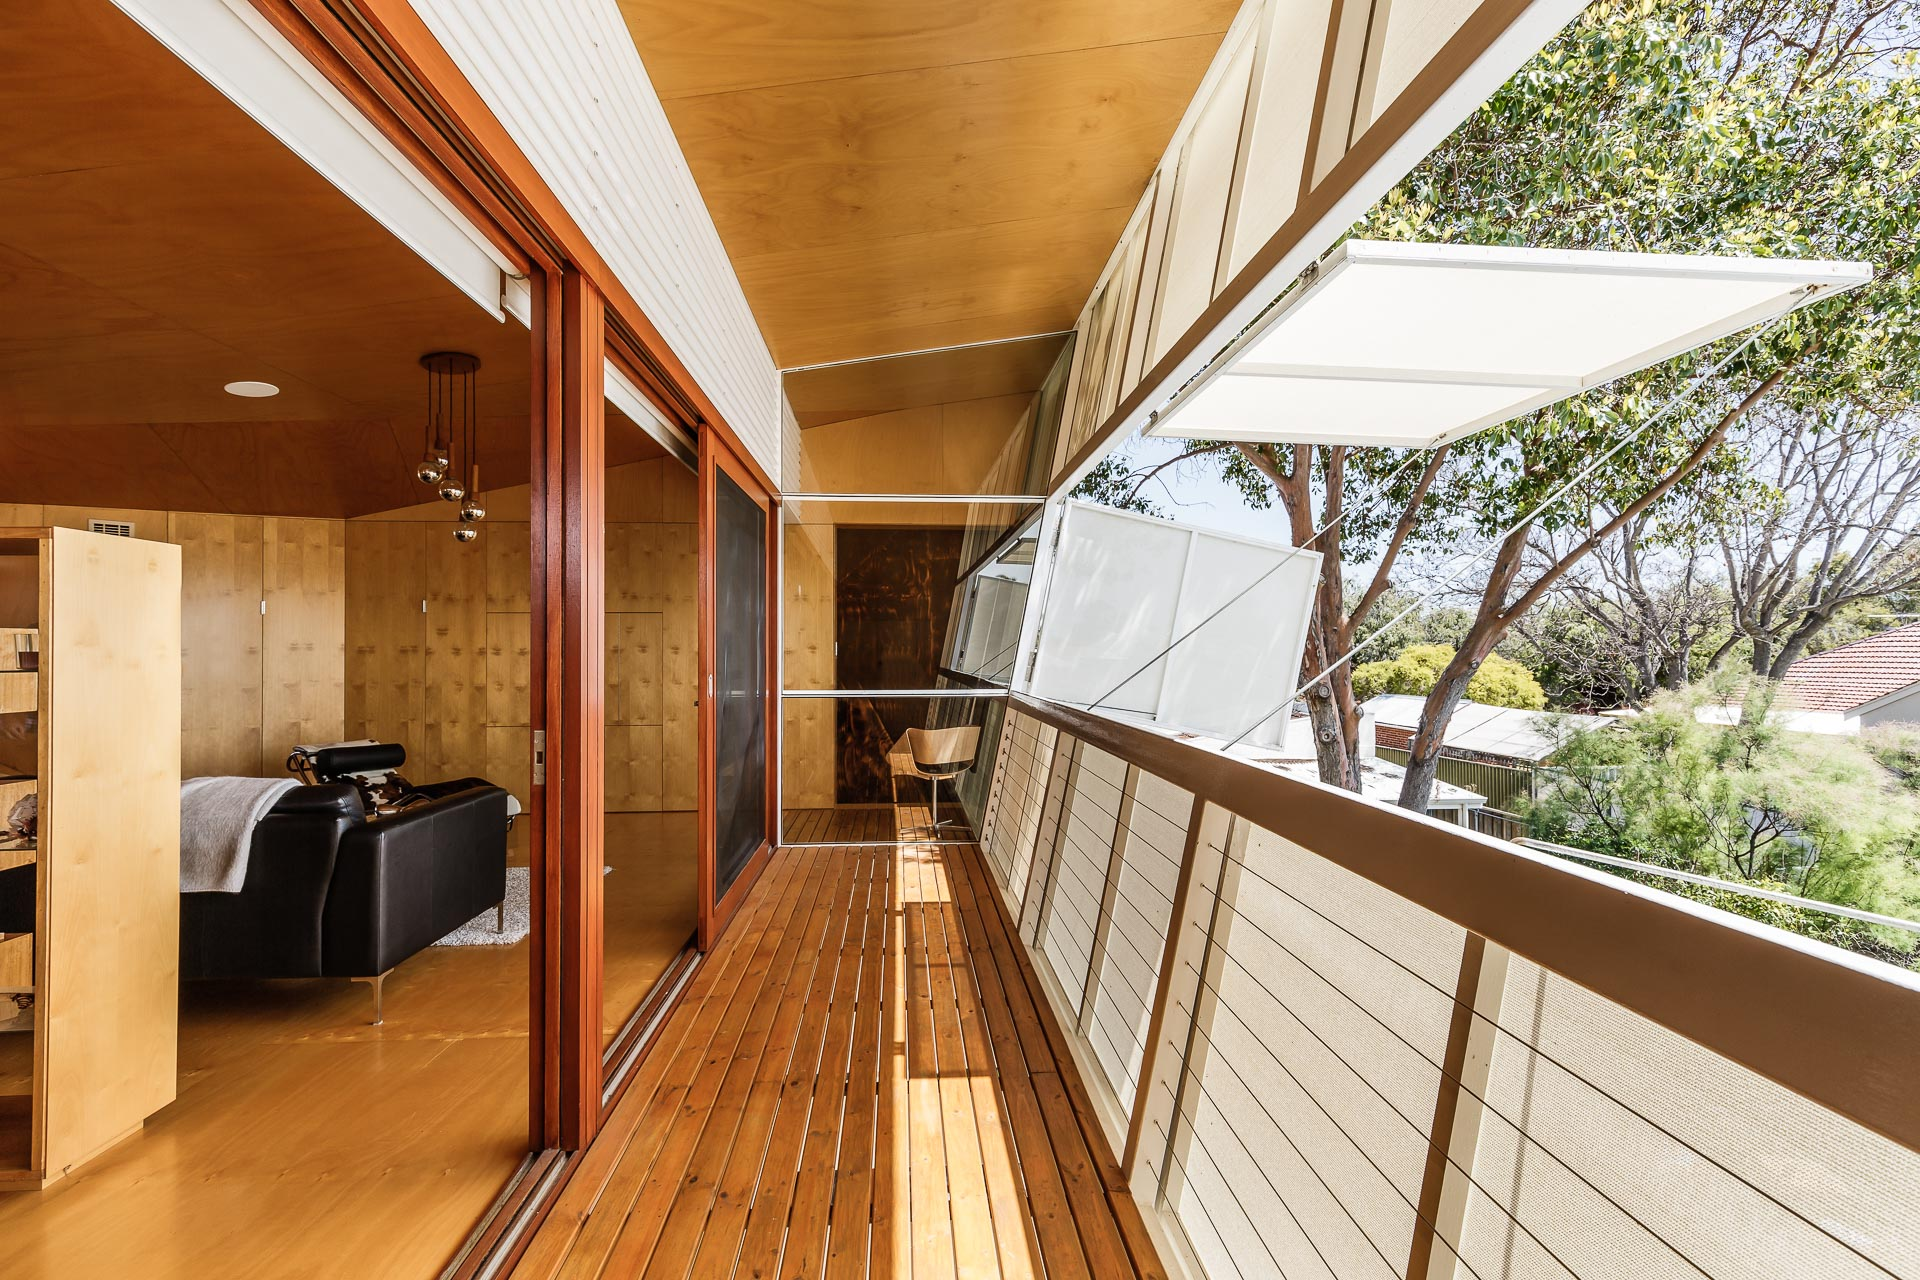 WEB - Architectural Photography Sydney - Open House Perth 2016  - Sebastian Photography 16.jpg